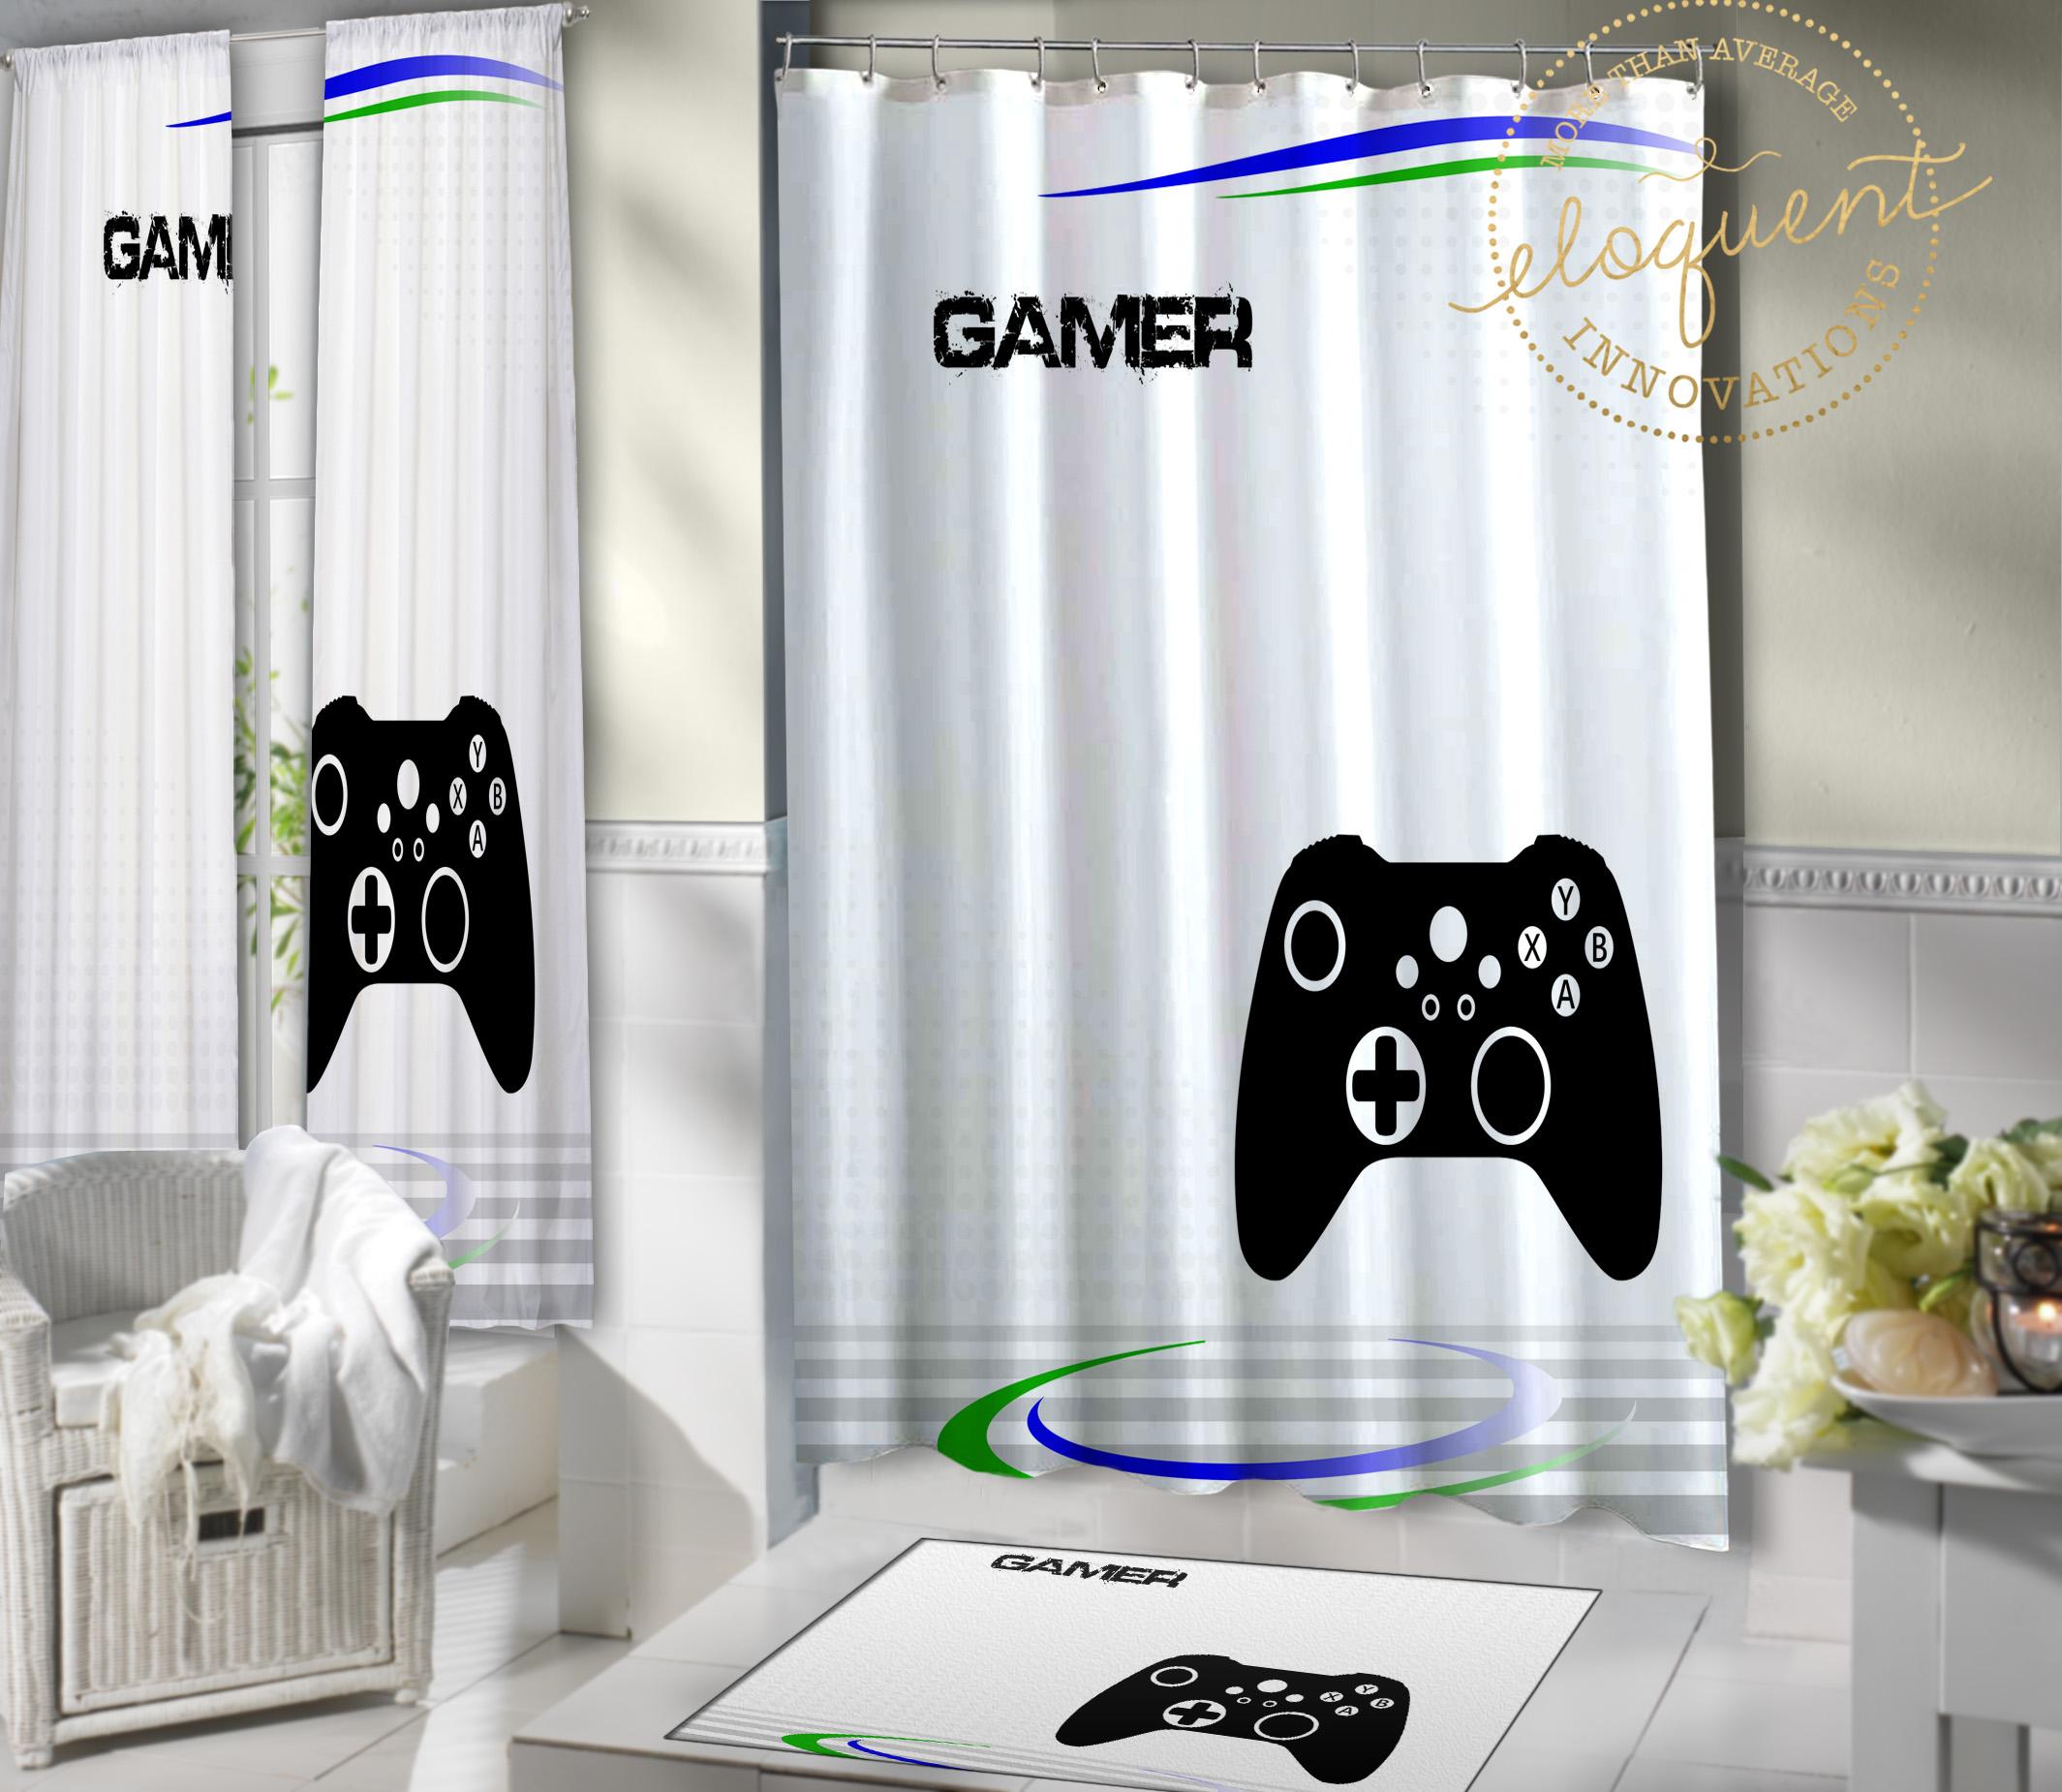 Gamer Bathroom Decor, Gaming, Bathroom Curtains, Video Game Art #10